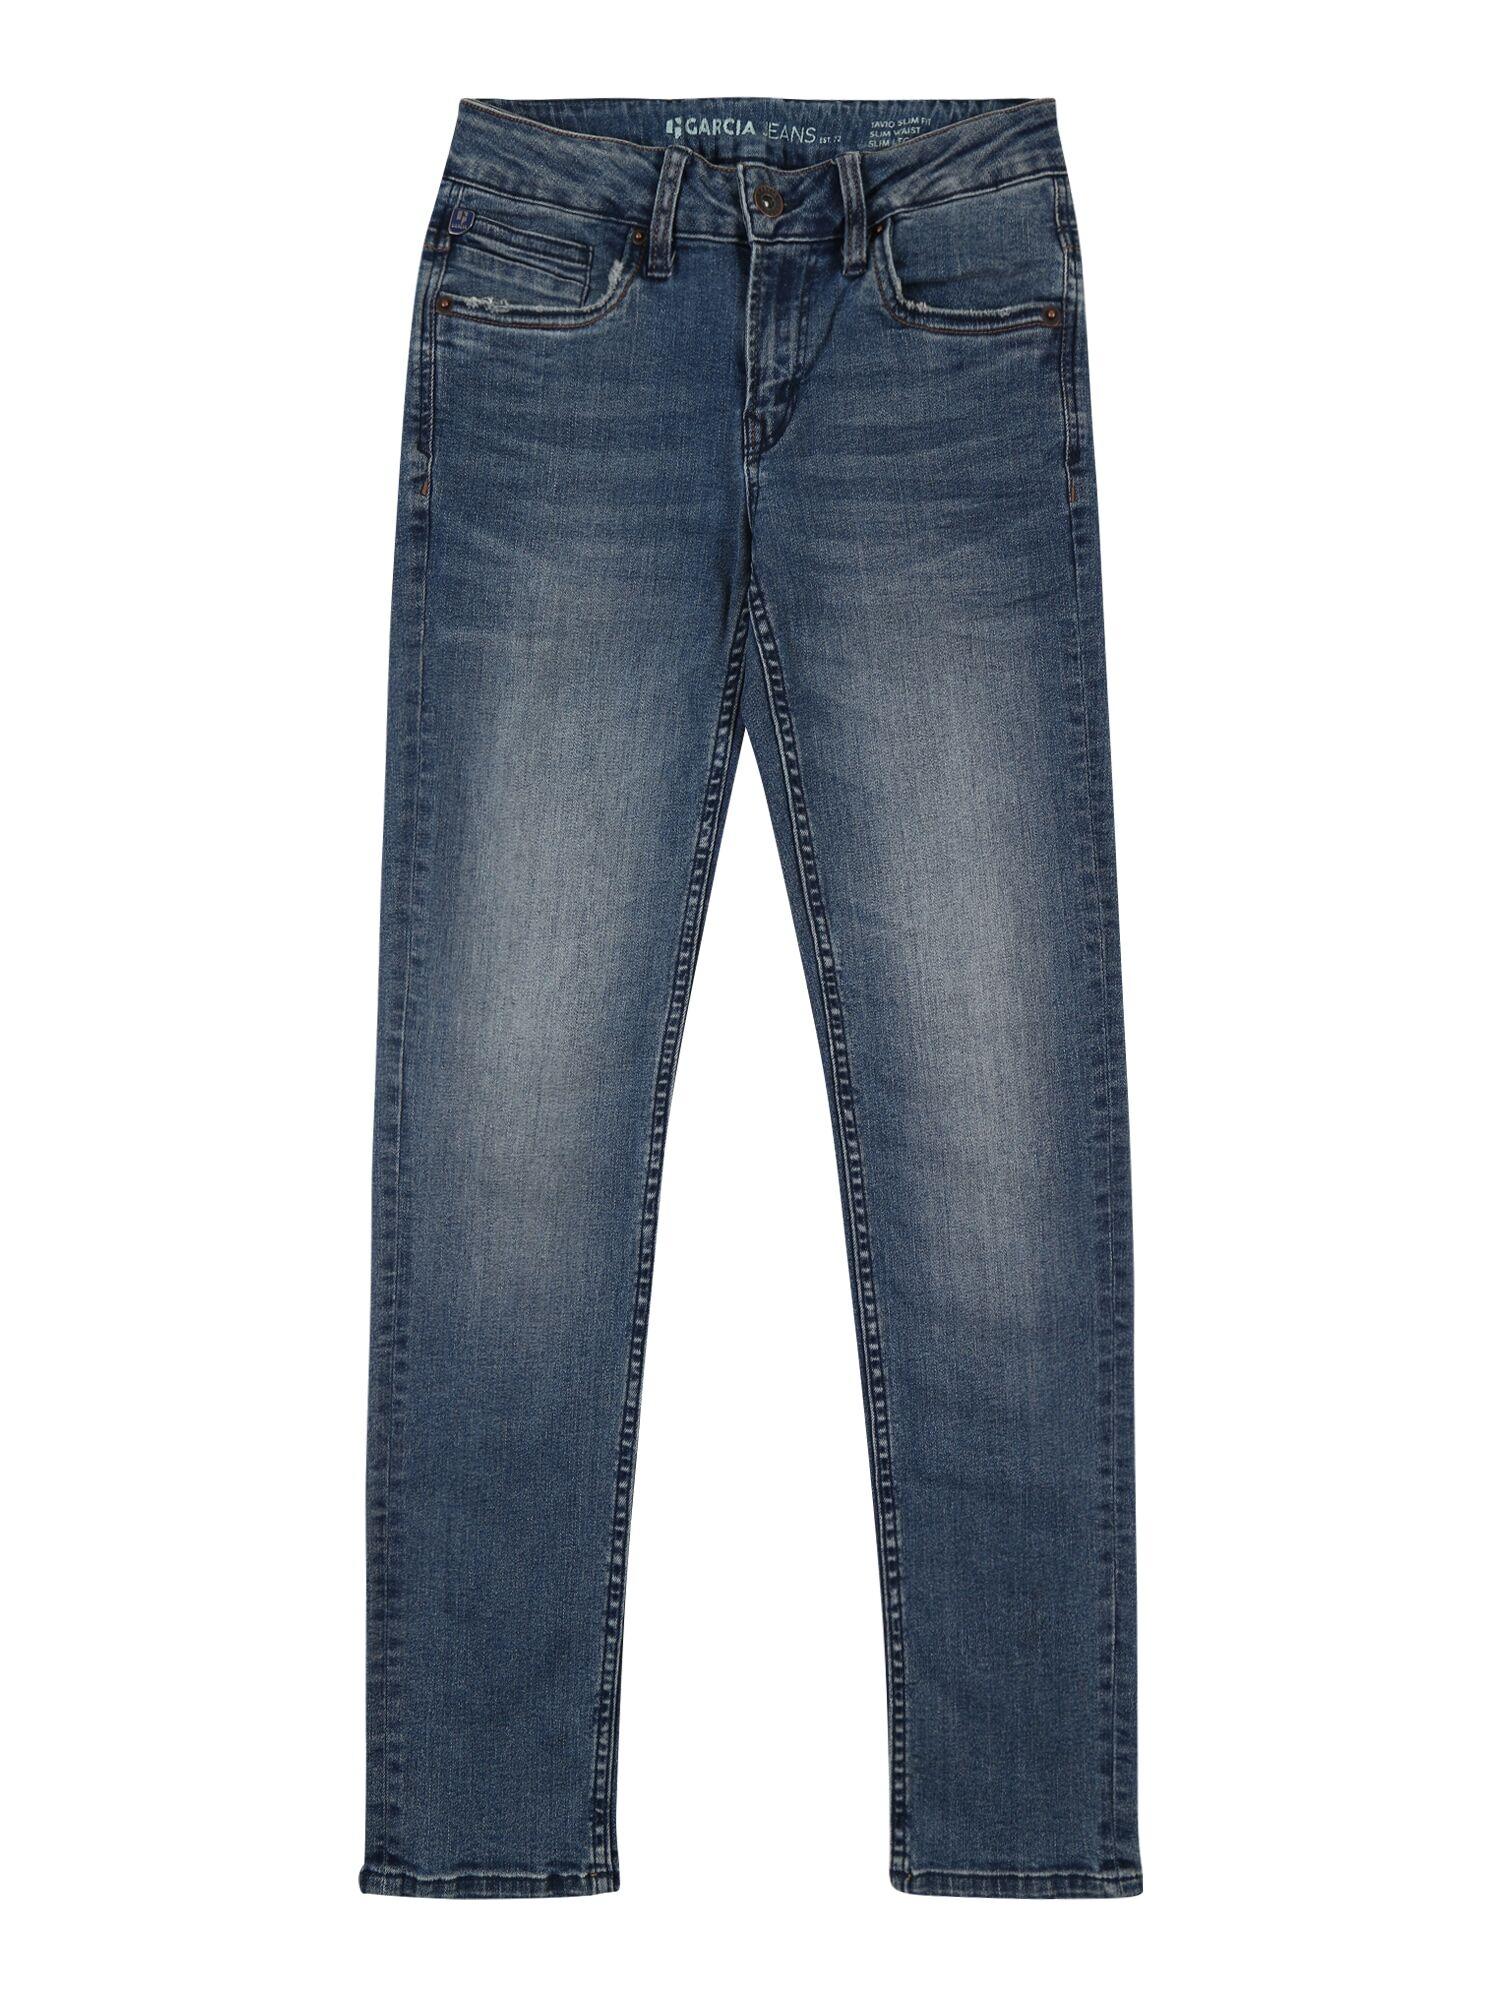 GARCIA Jean 'TAVIO'  - Bleu - Taille: 176 - boy